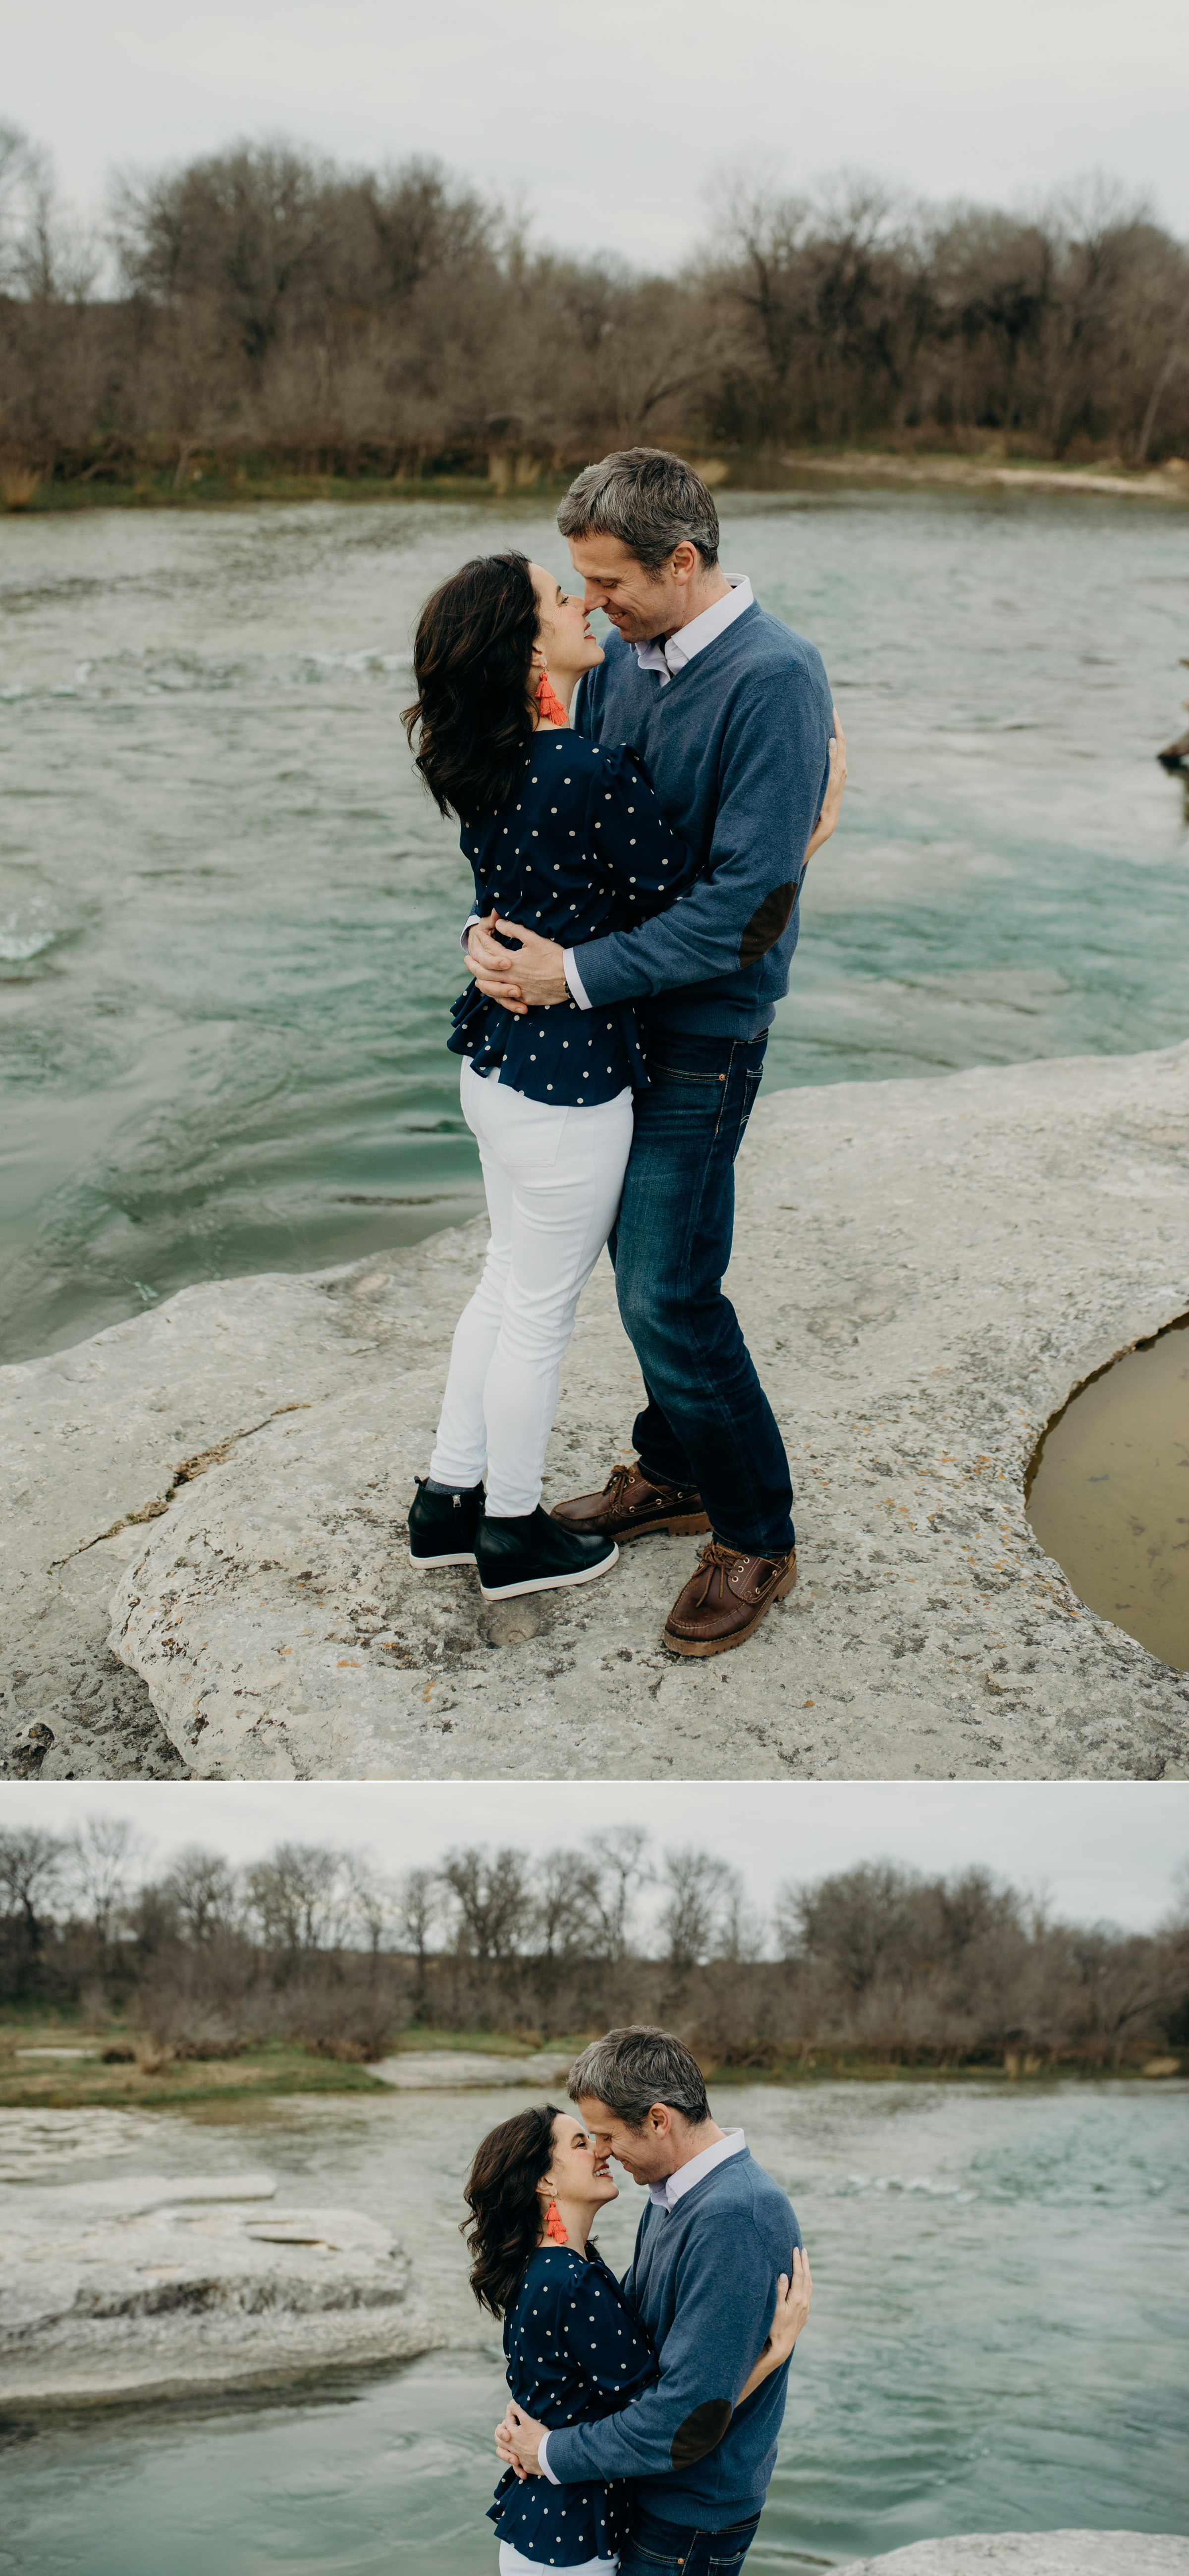 austin-mckinney-falls-engagement-photographer-elopement-prices-best-headshot-senior-adventurous-italy-minneapolis-texas-minnesota-dallas-houston-tulum-mexico_0012.jpg